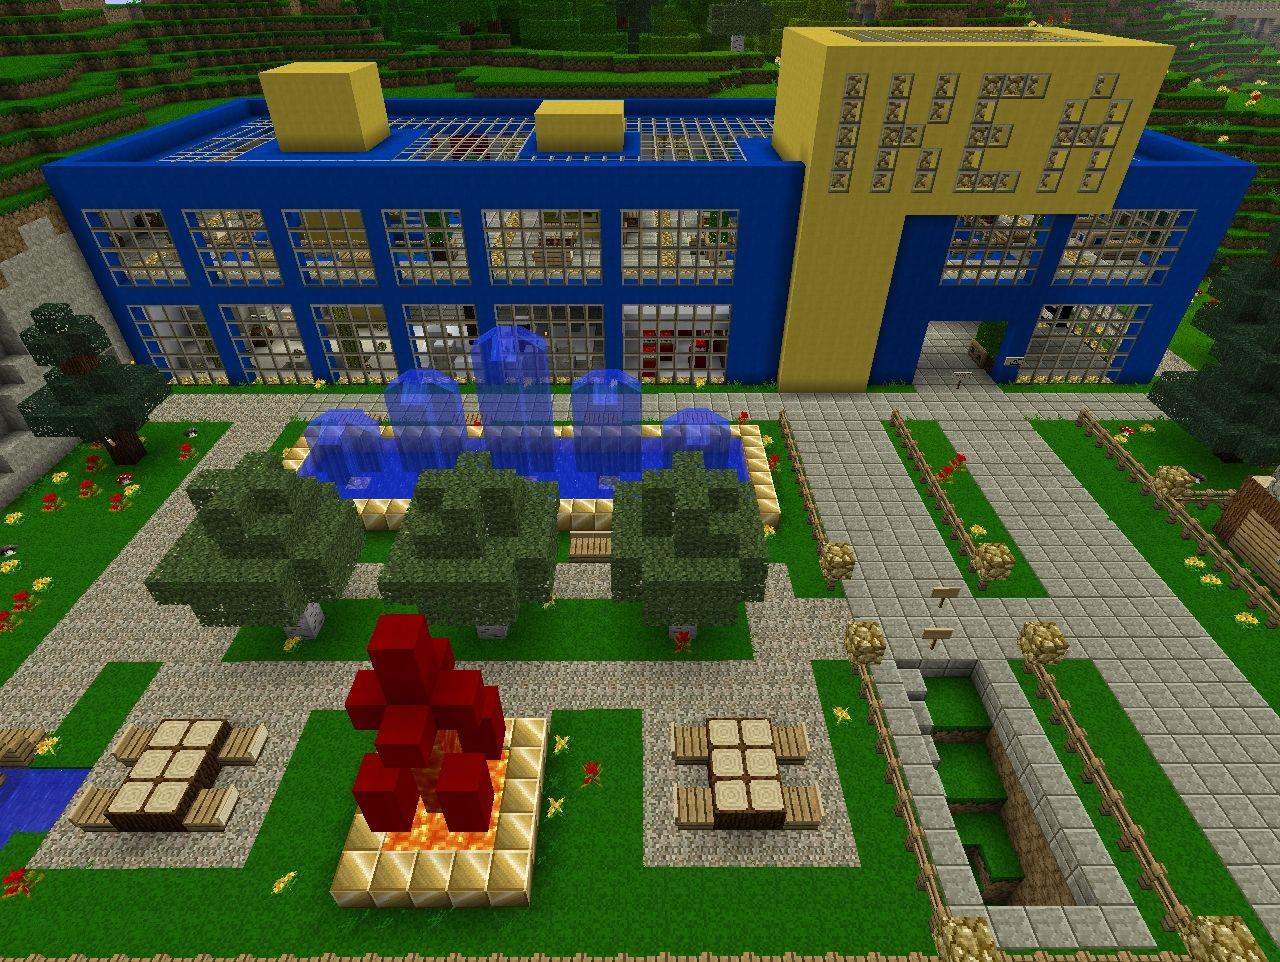 Ikea Shopping Mall Minecraft Project